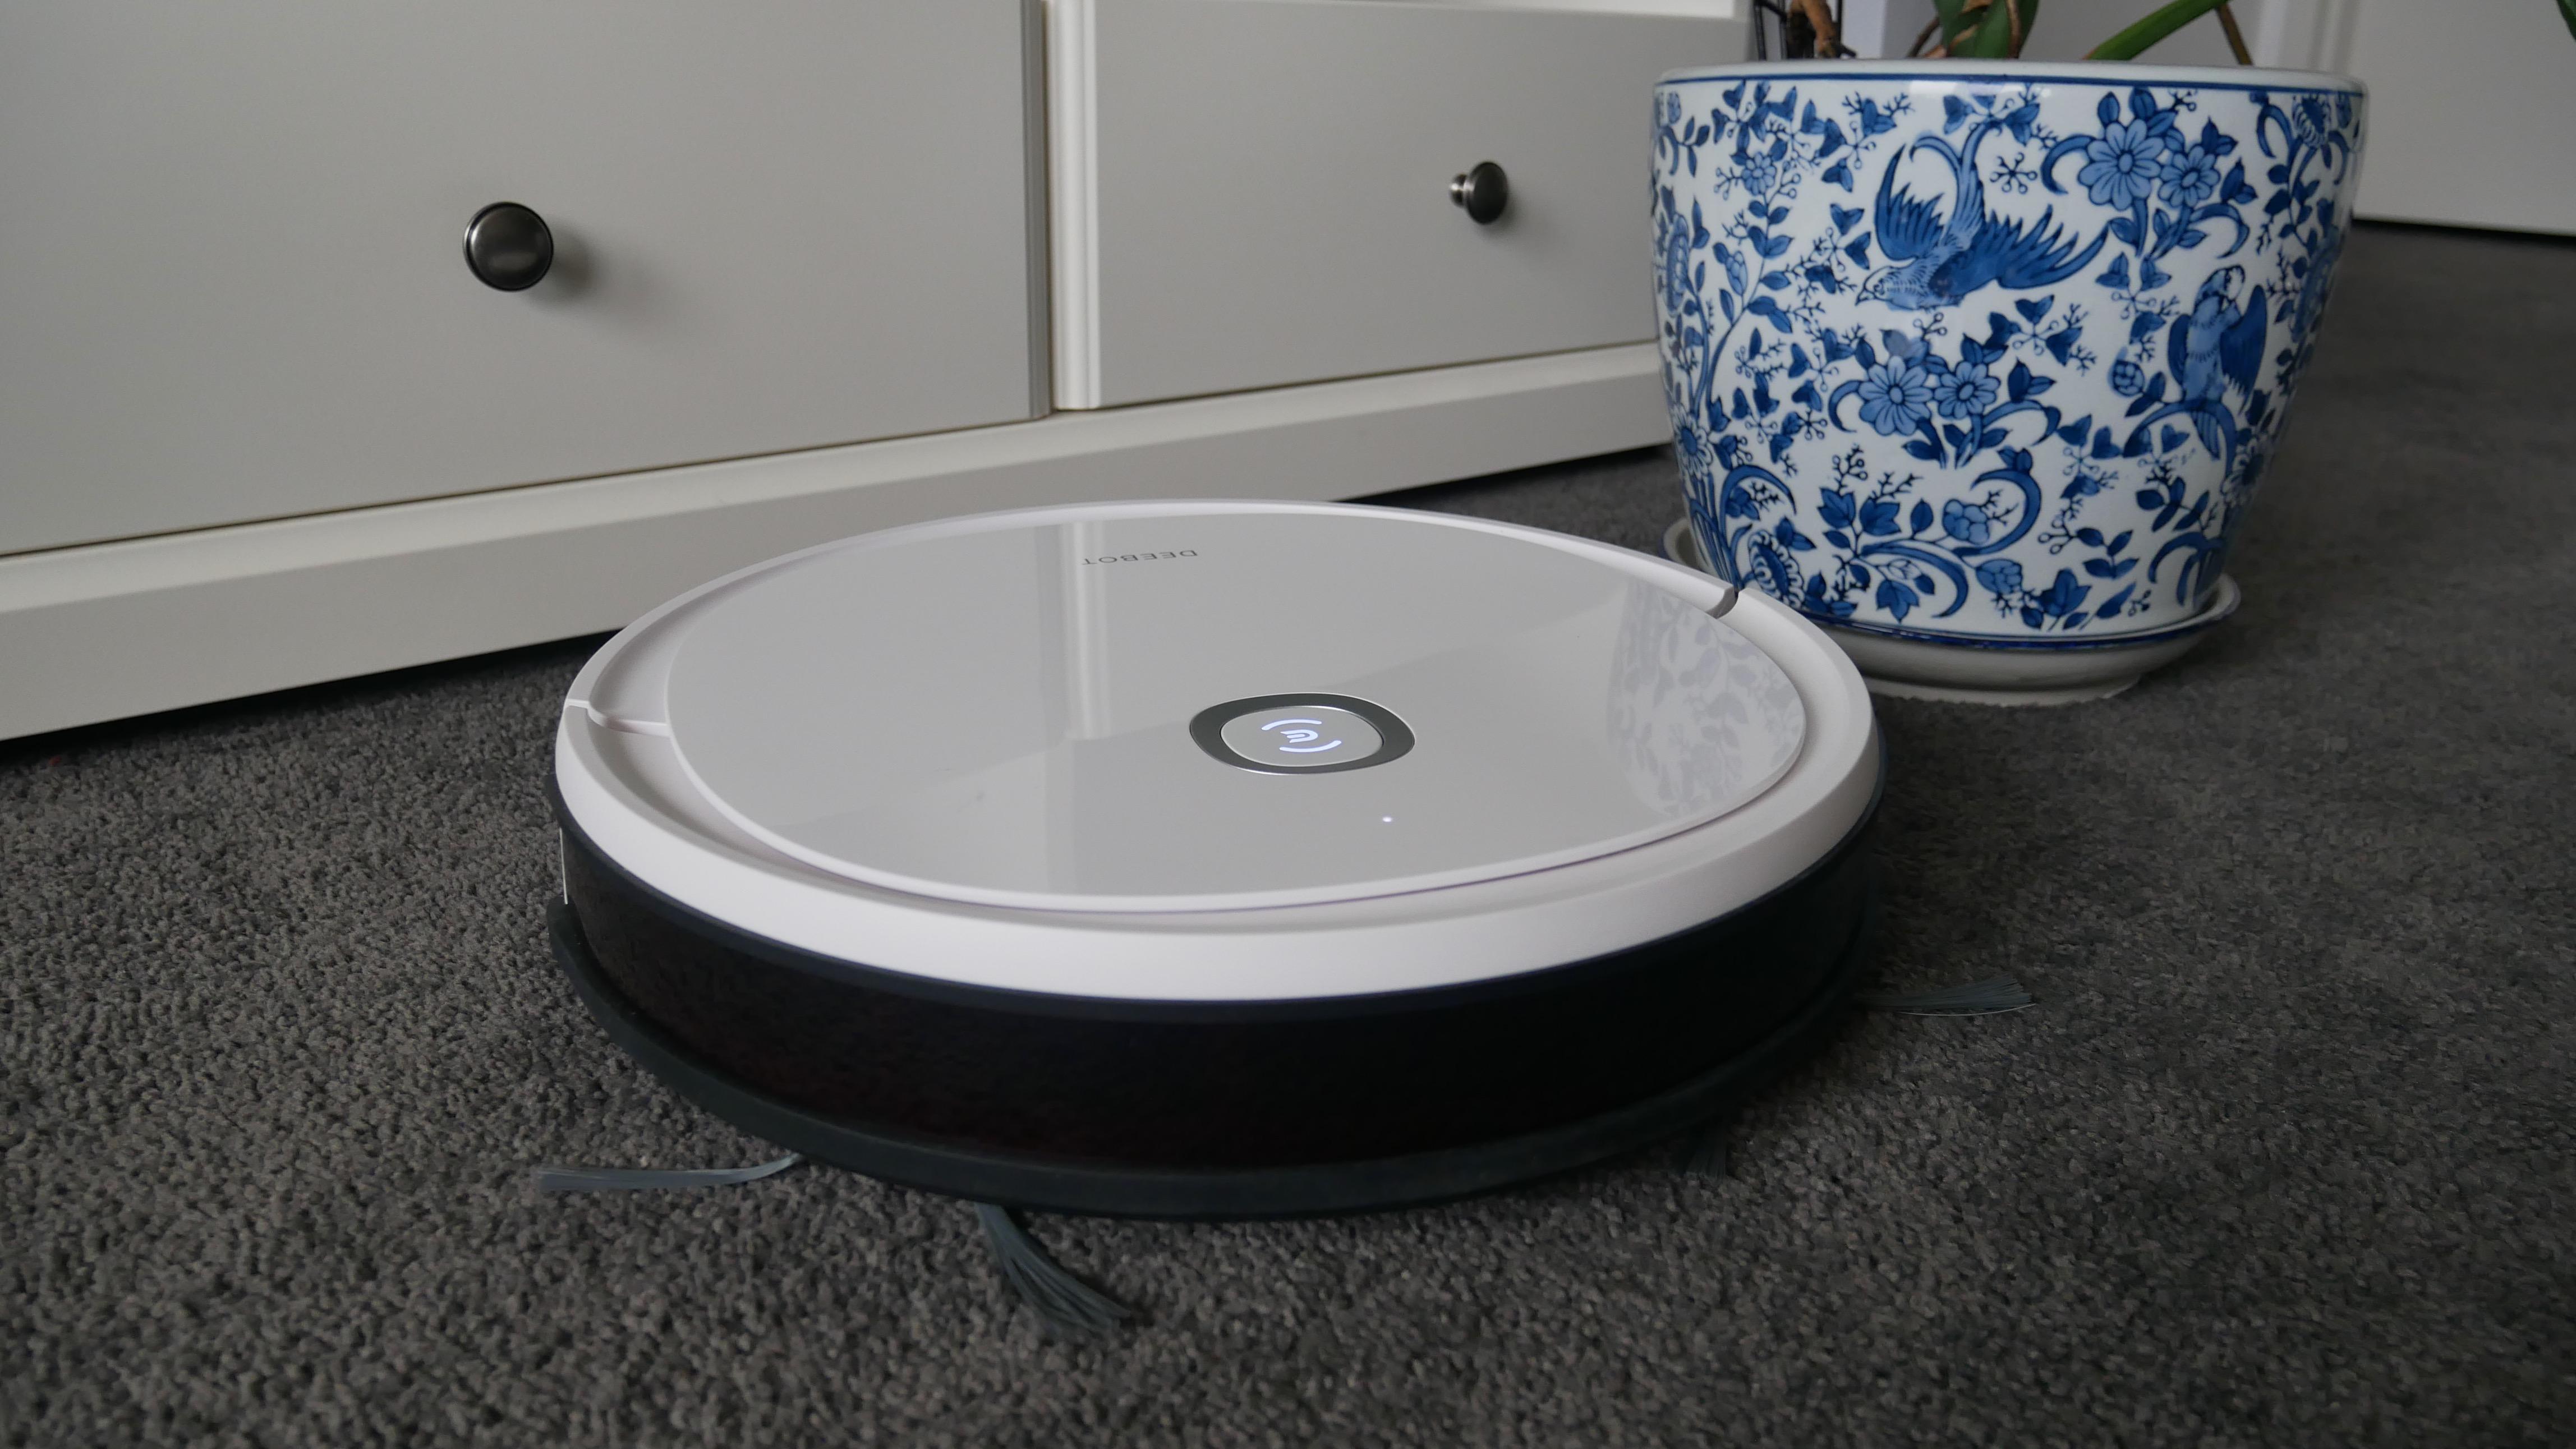 Ecovacs Deebot U2 robot vacuum